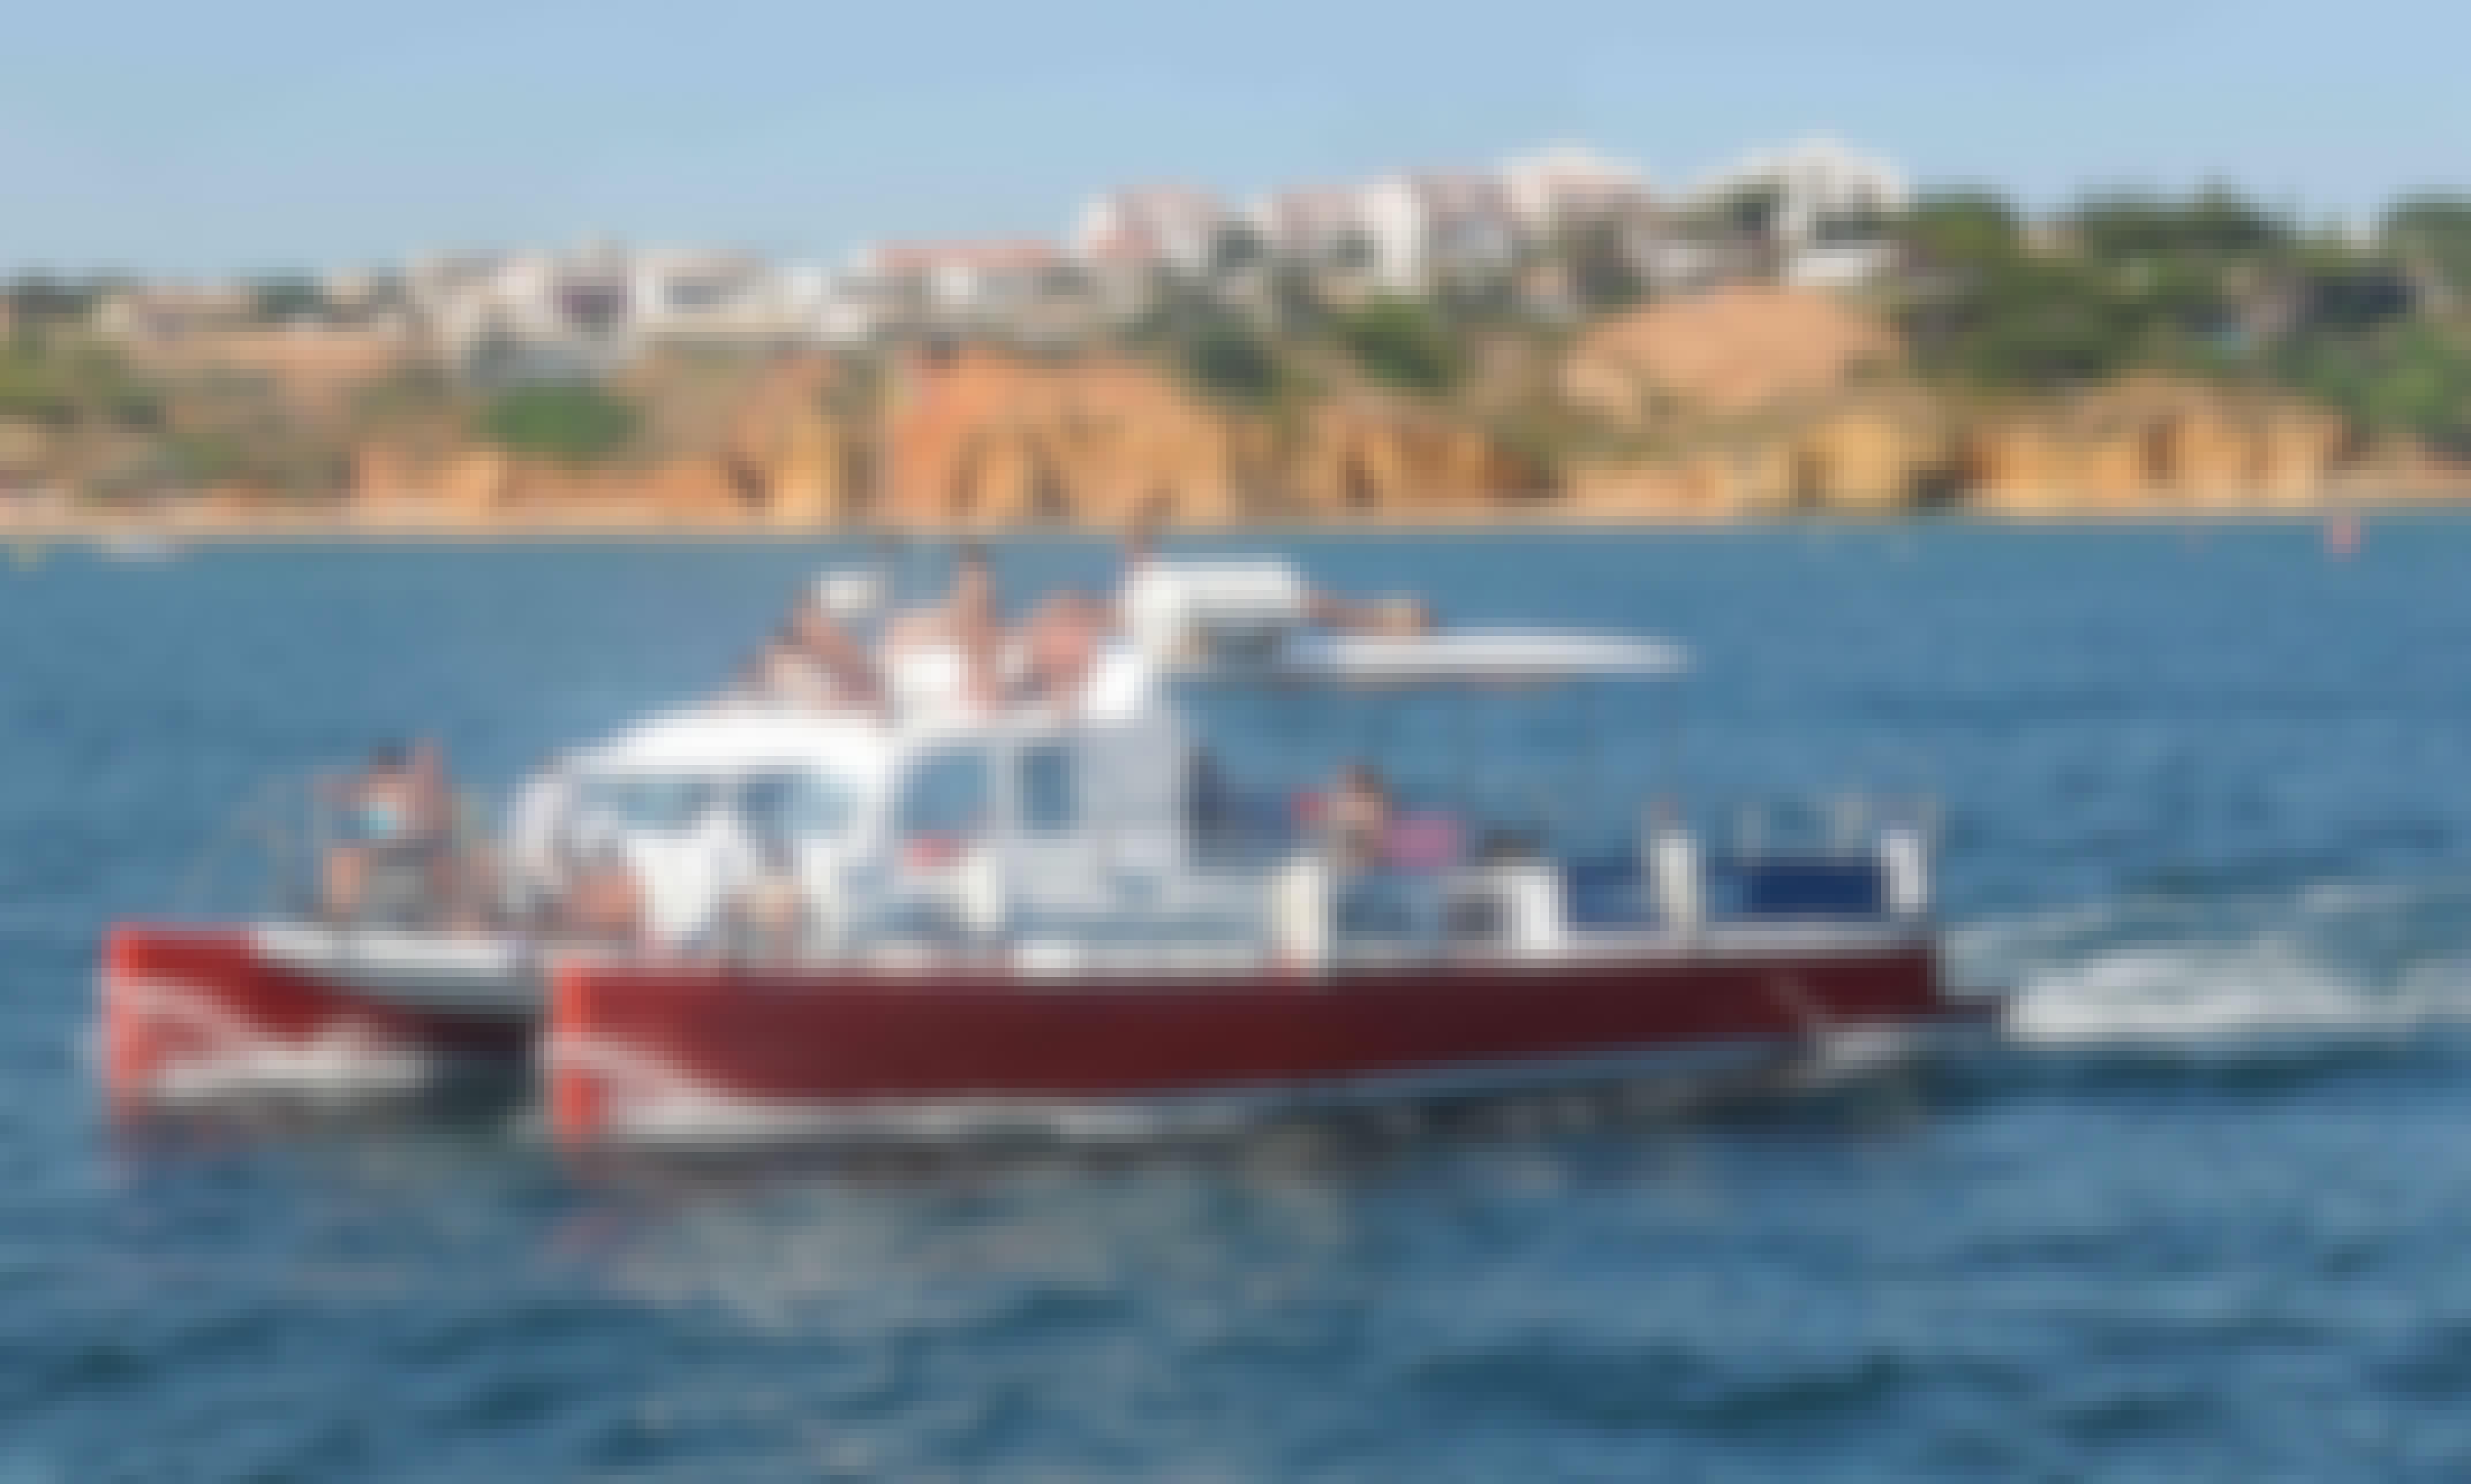 50' Party Catamaran for 44 People in Quarteira, Faro